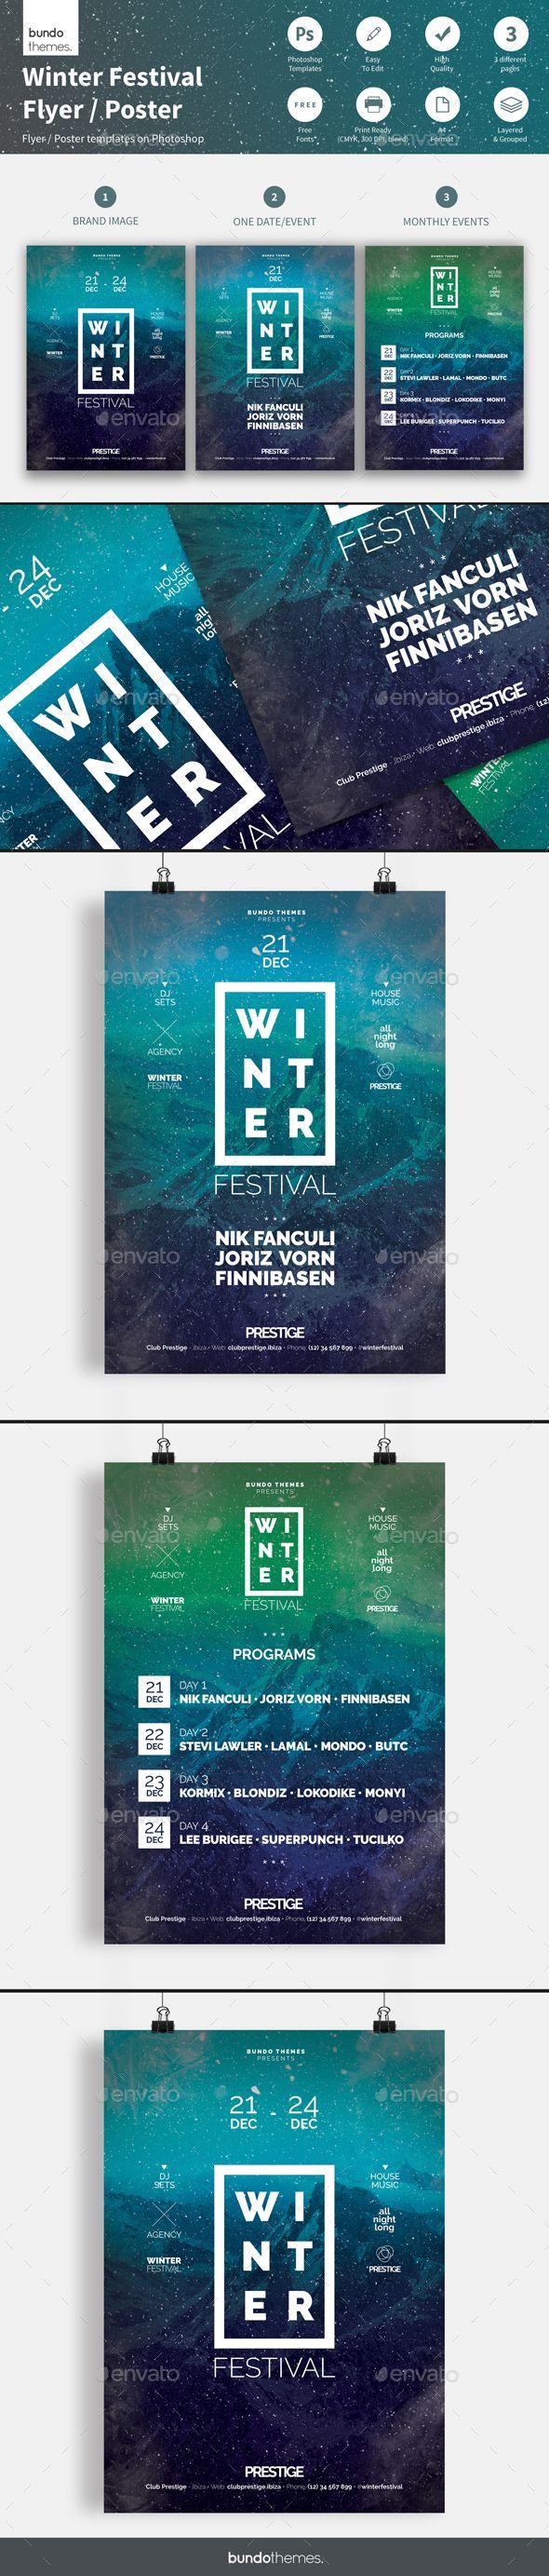 Winter Festival Flyer / Poster Template PSD